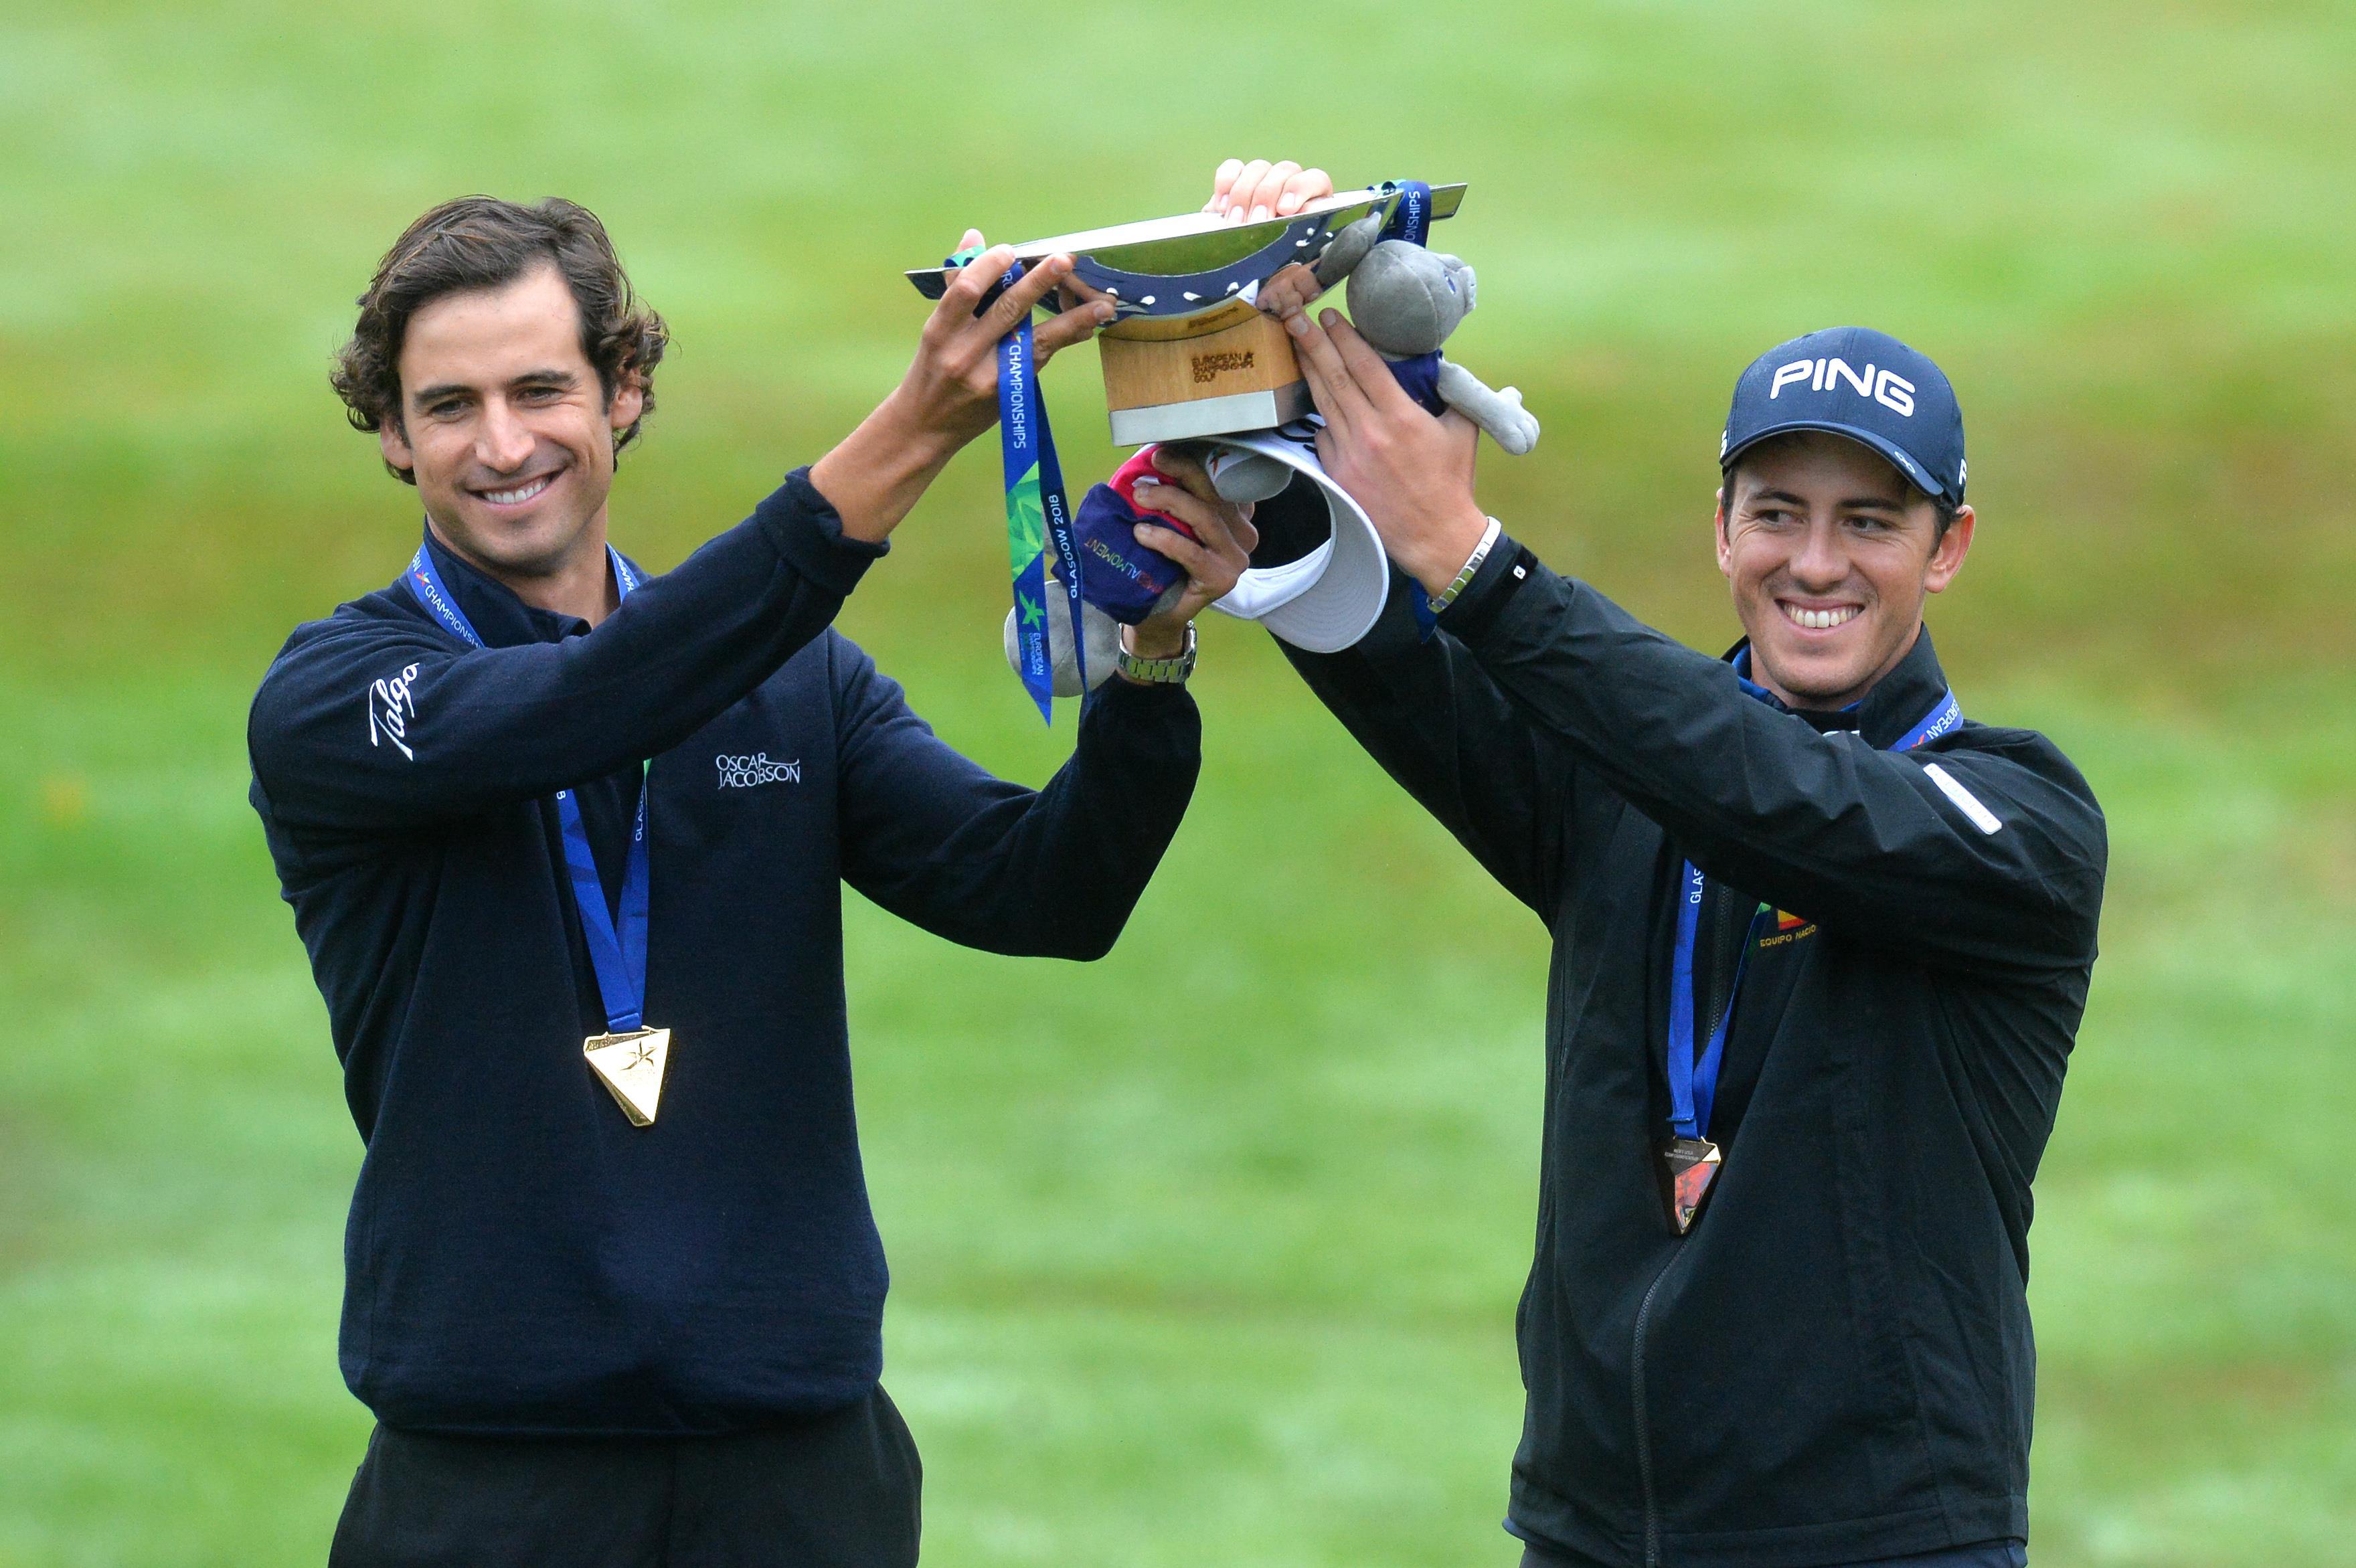 Pedro Oriol y Scott Fernández en el European Team Championships2018 ©Getty Images